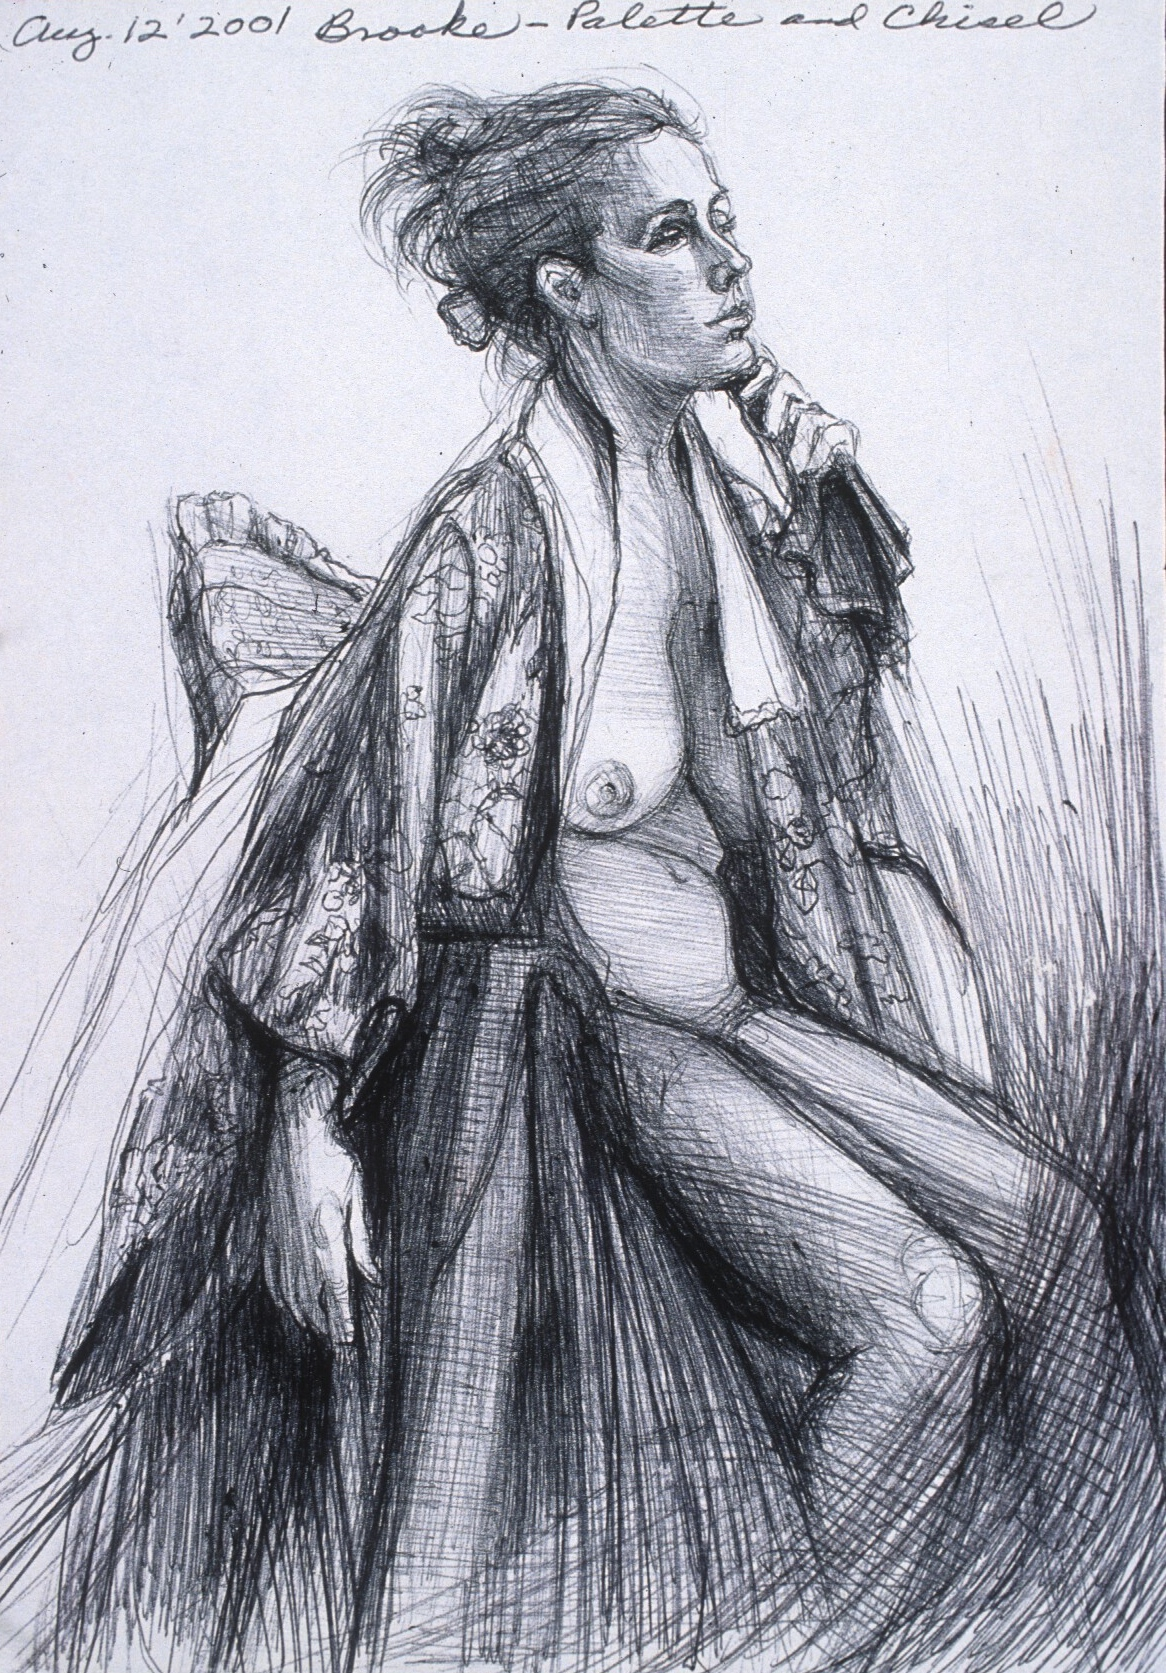 "Lou Ann Burkhardt  Brooke  , 2001 Pen and ink on paper 13-1/2"" x 16-1/2"" framed"